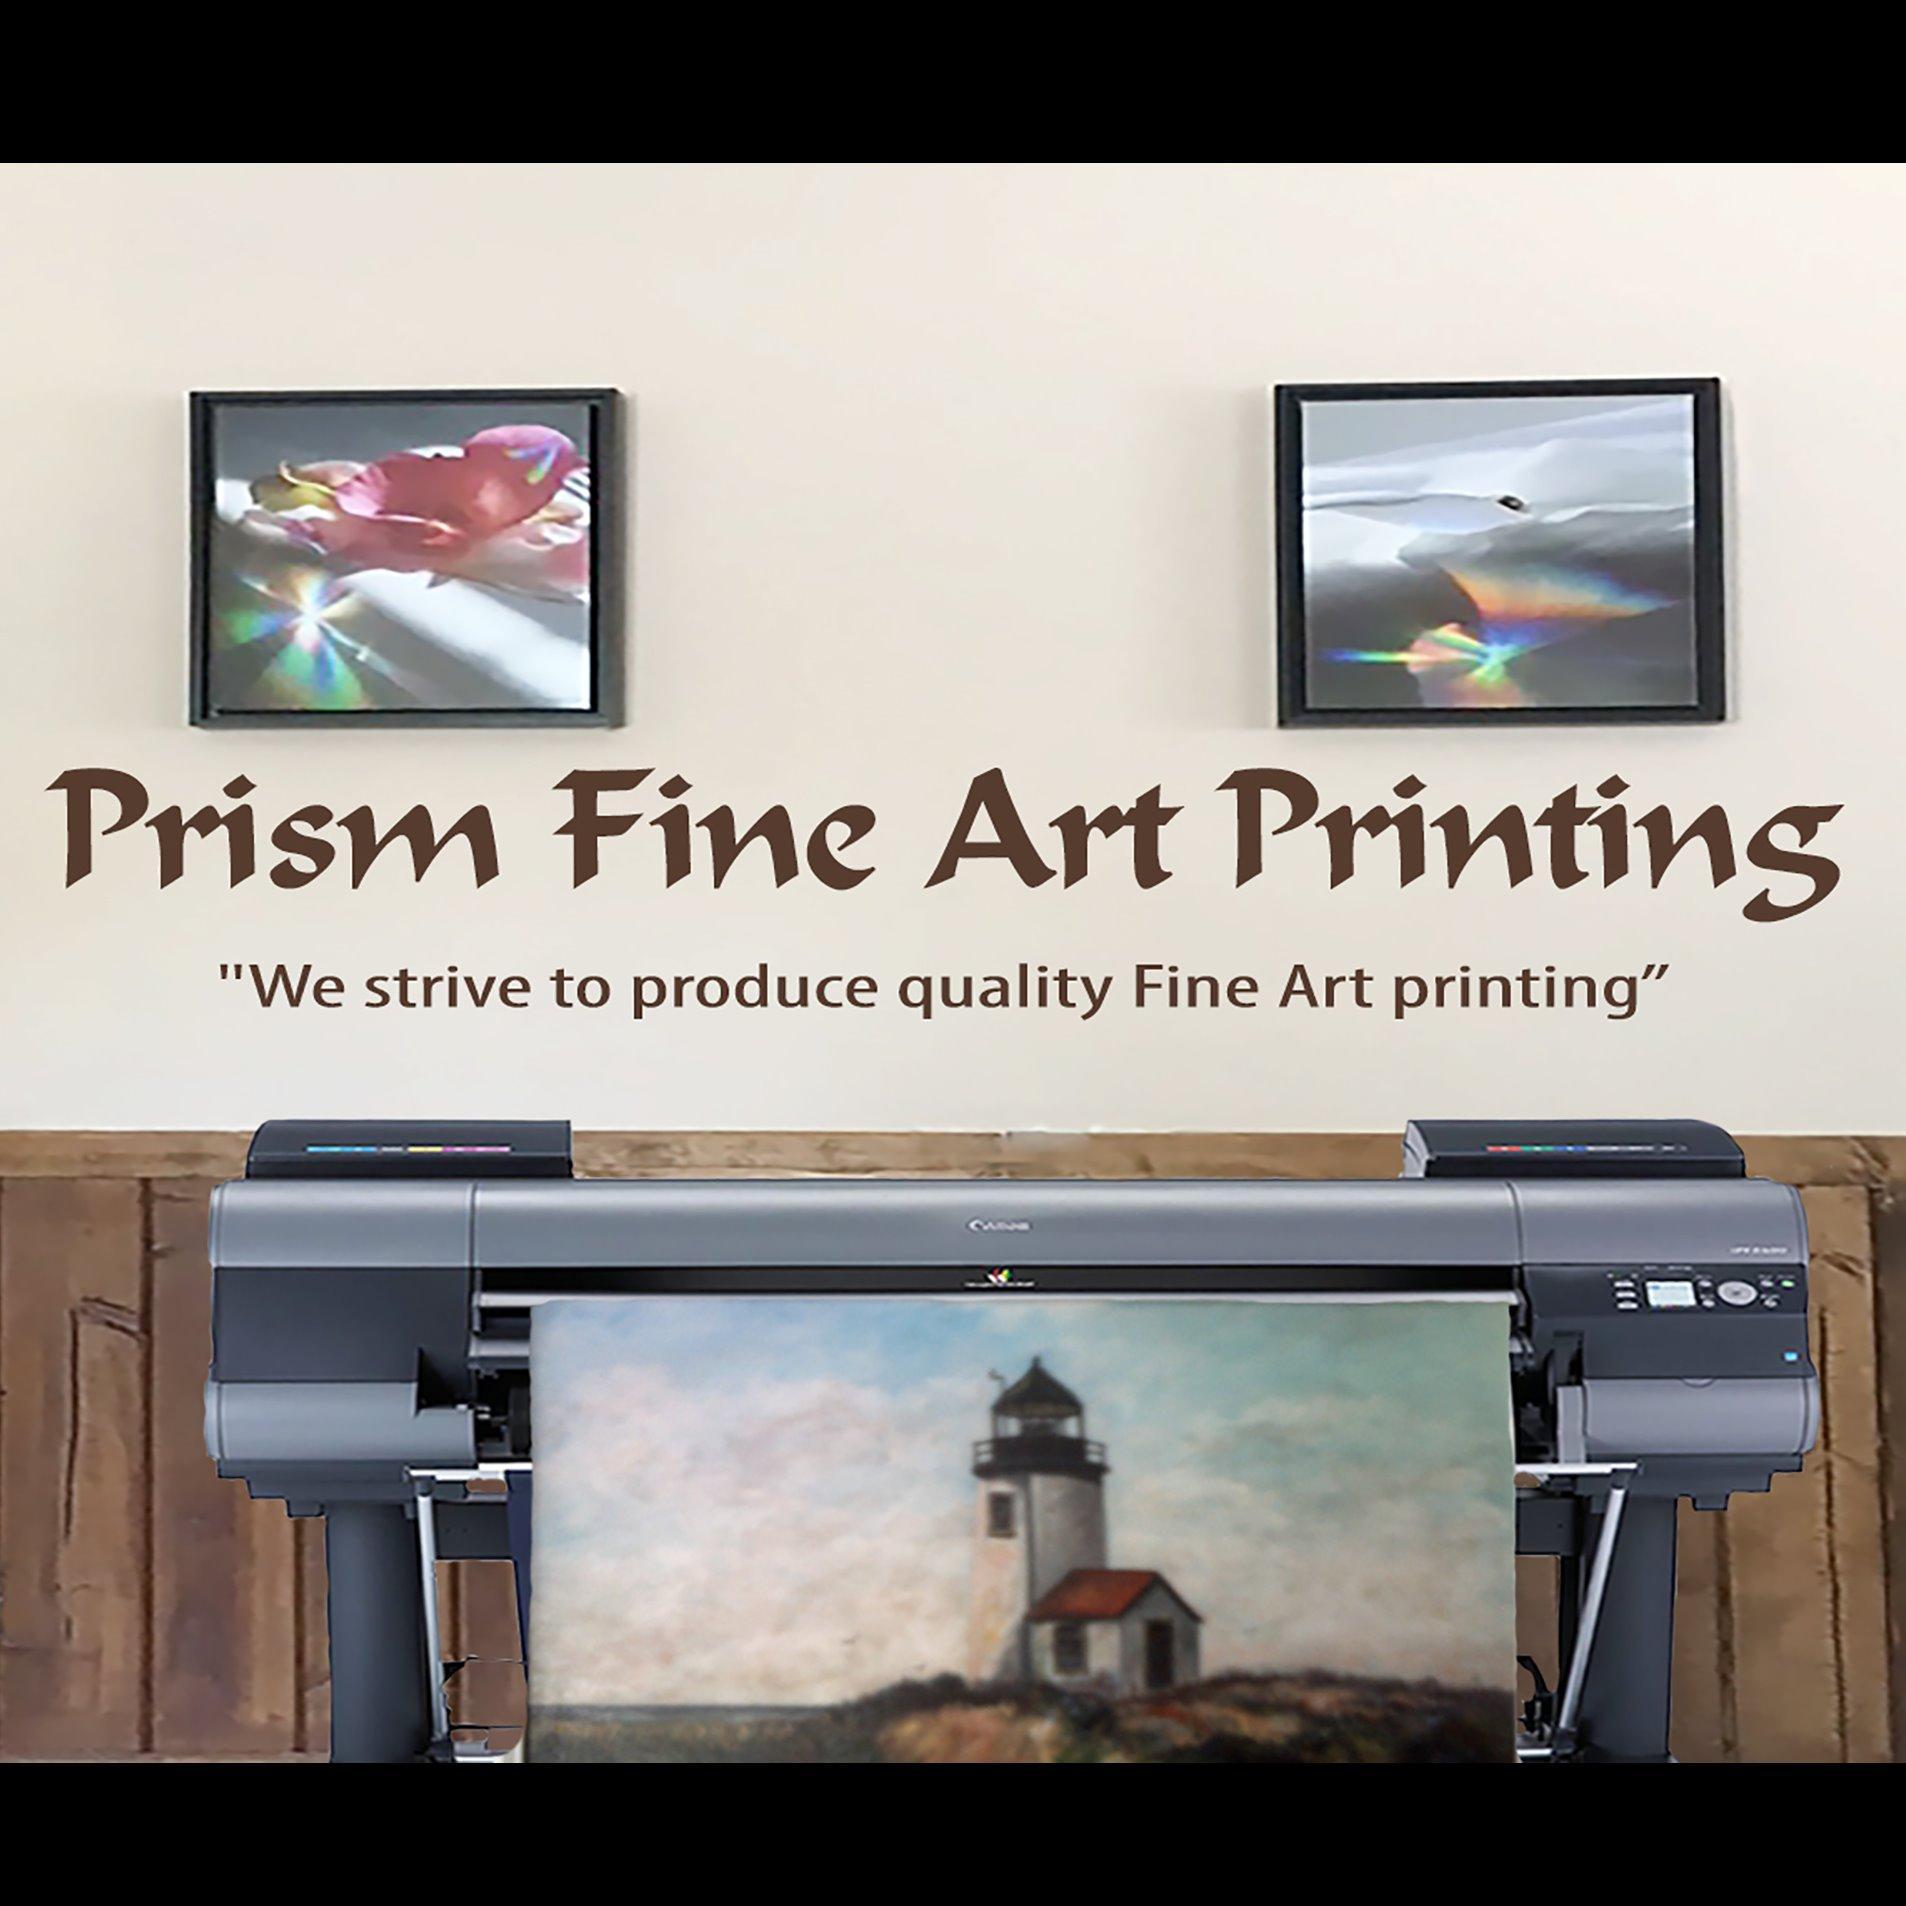 Prism Fine Art Printing image 1